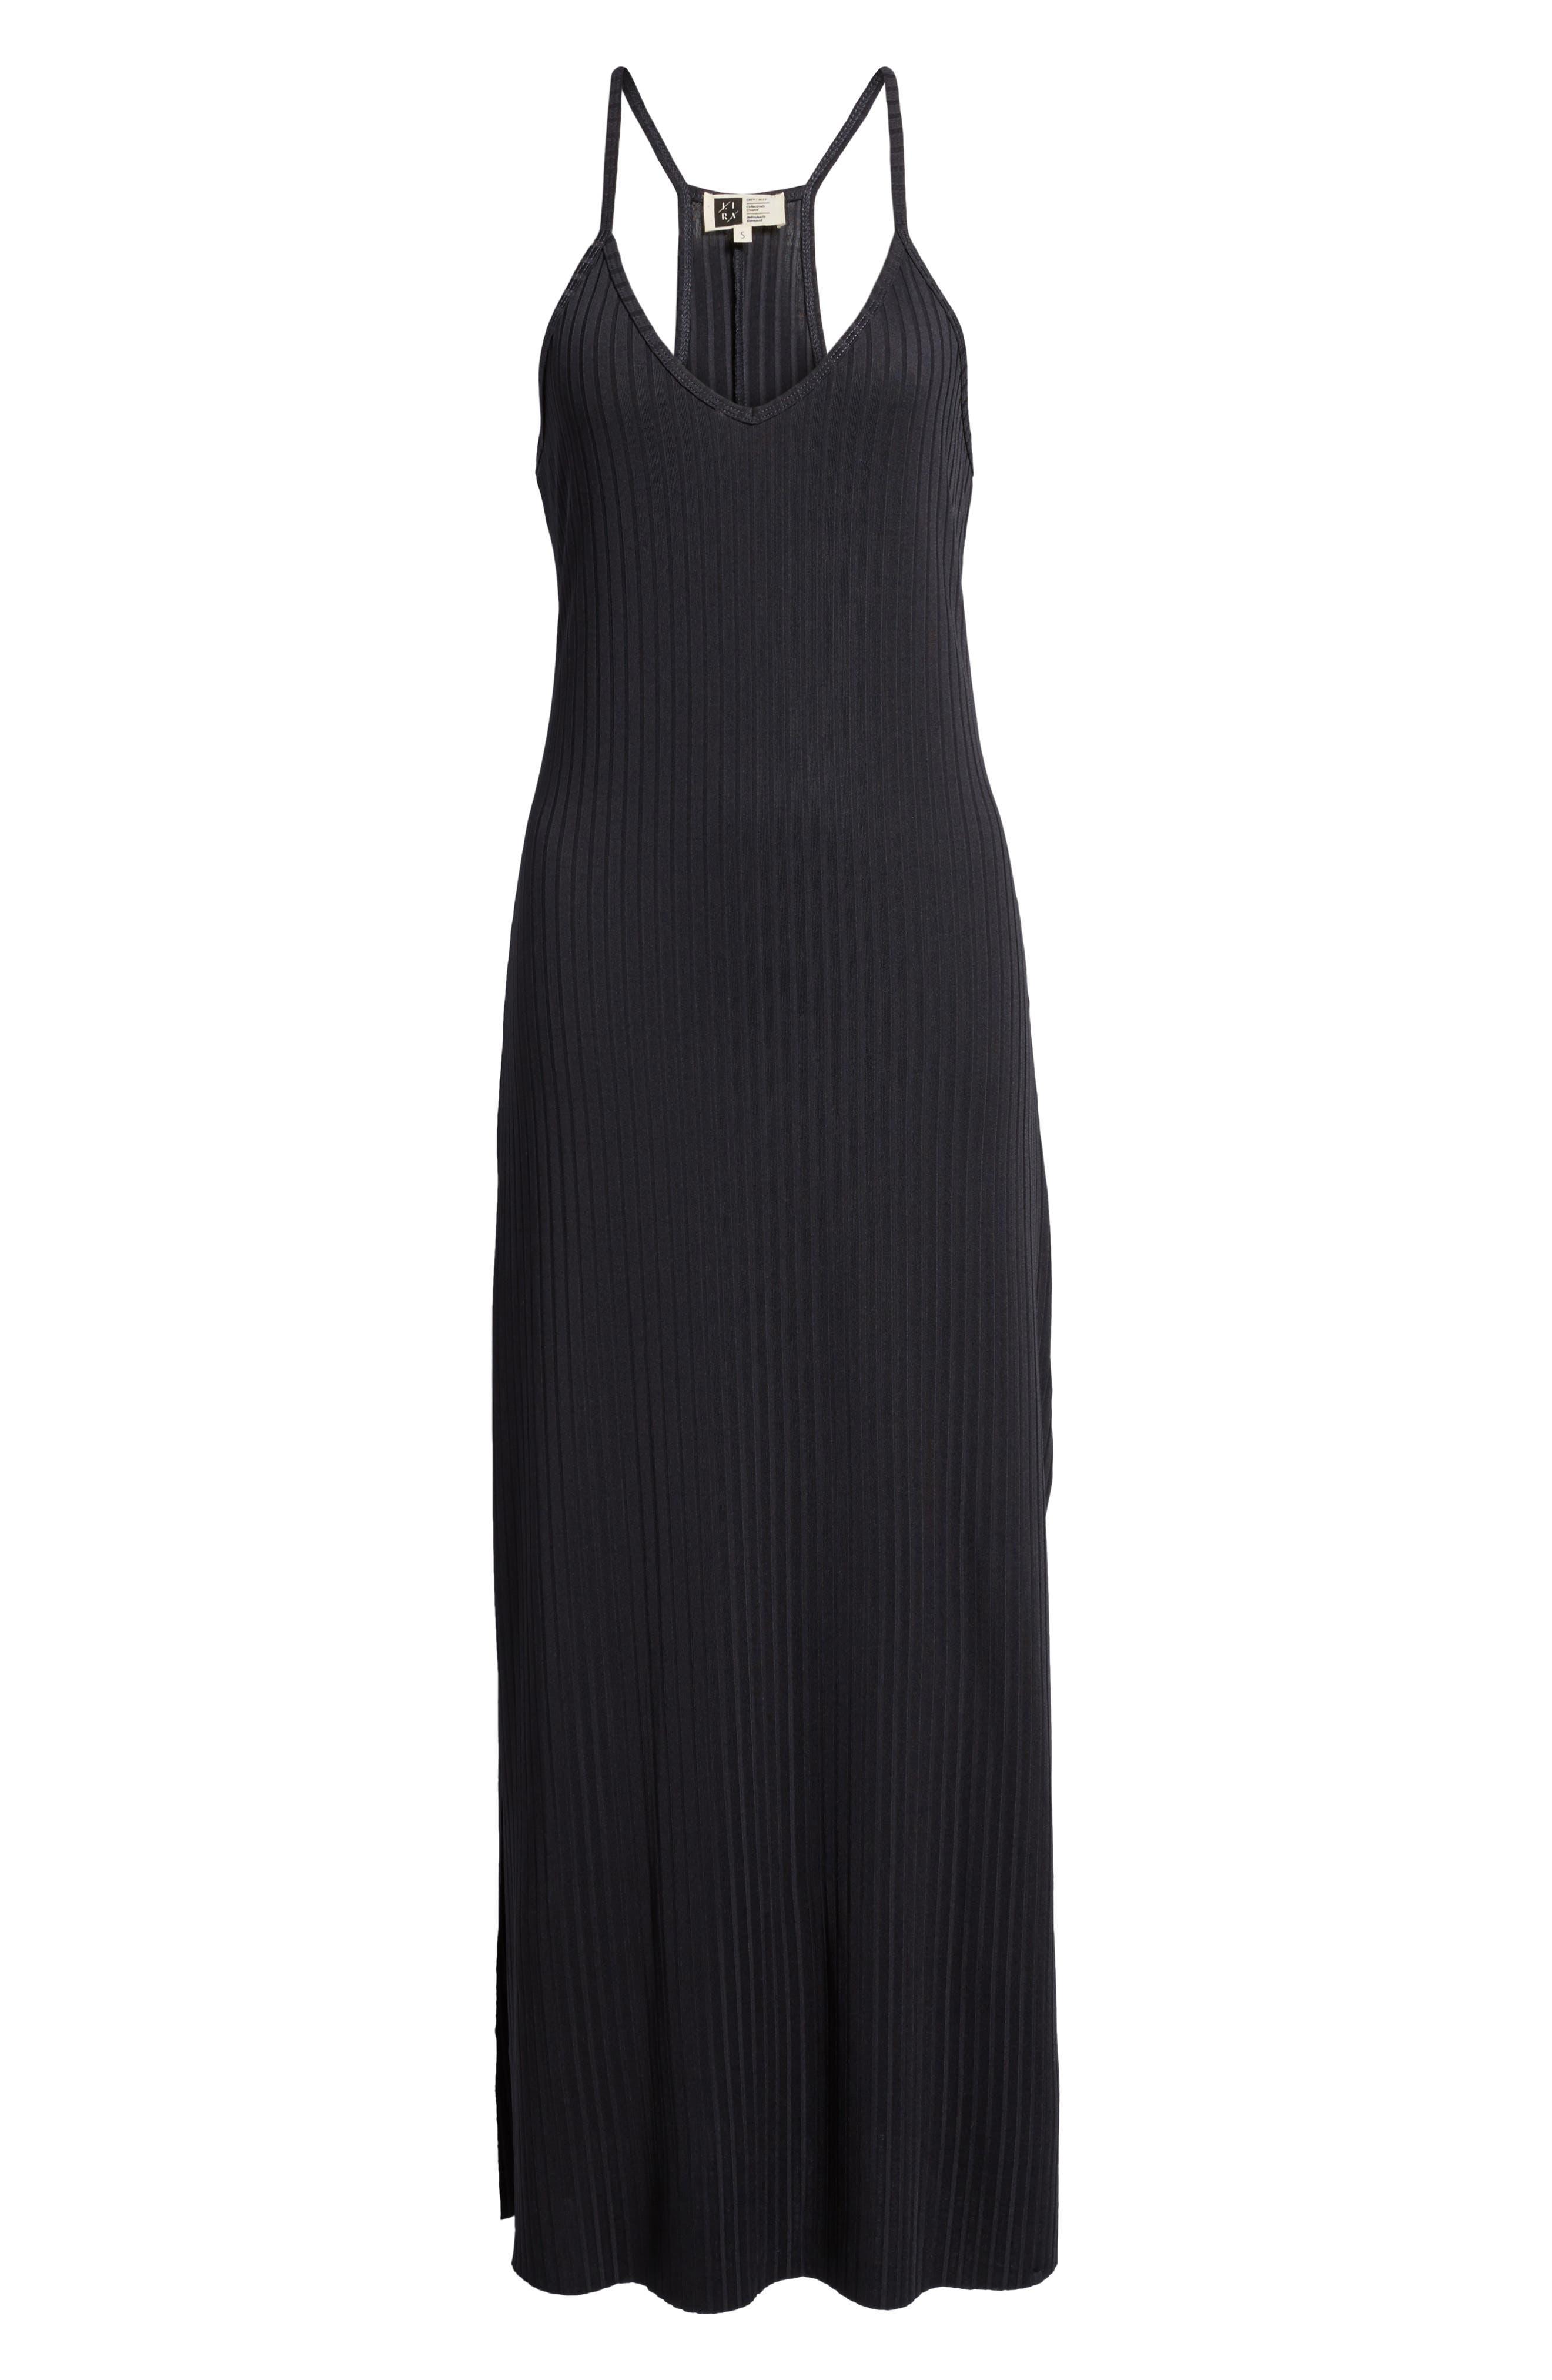 Ashlynn Ribbed Maxi Dress,                             Alternate thumbnail 8, color,                             Navy